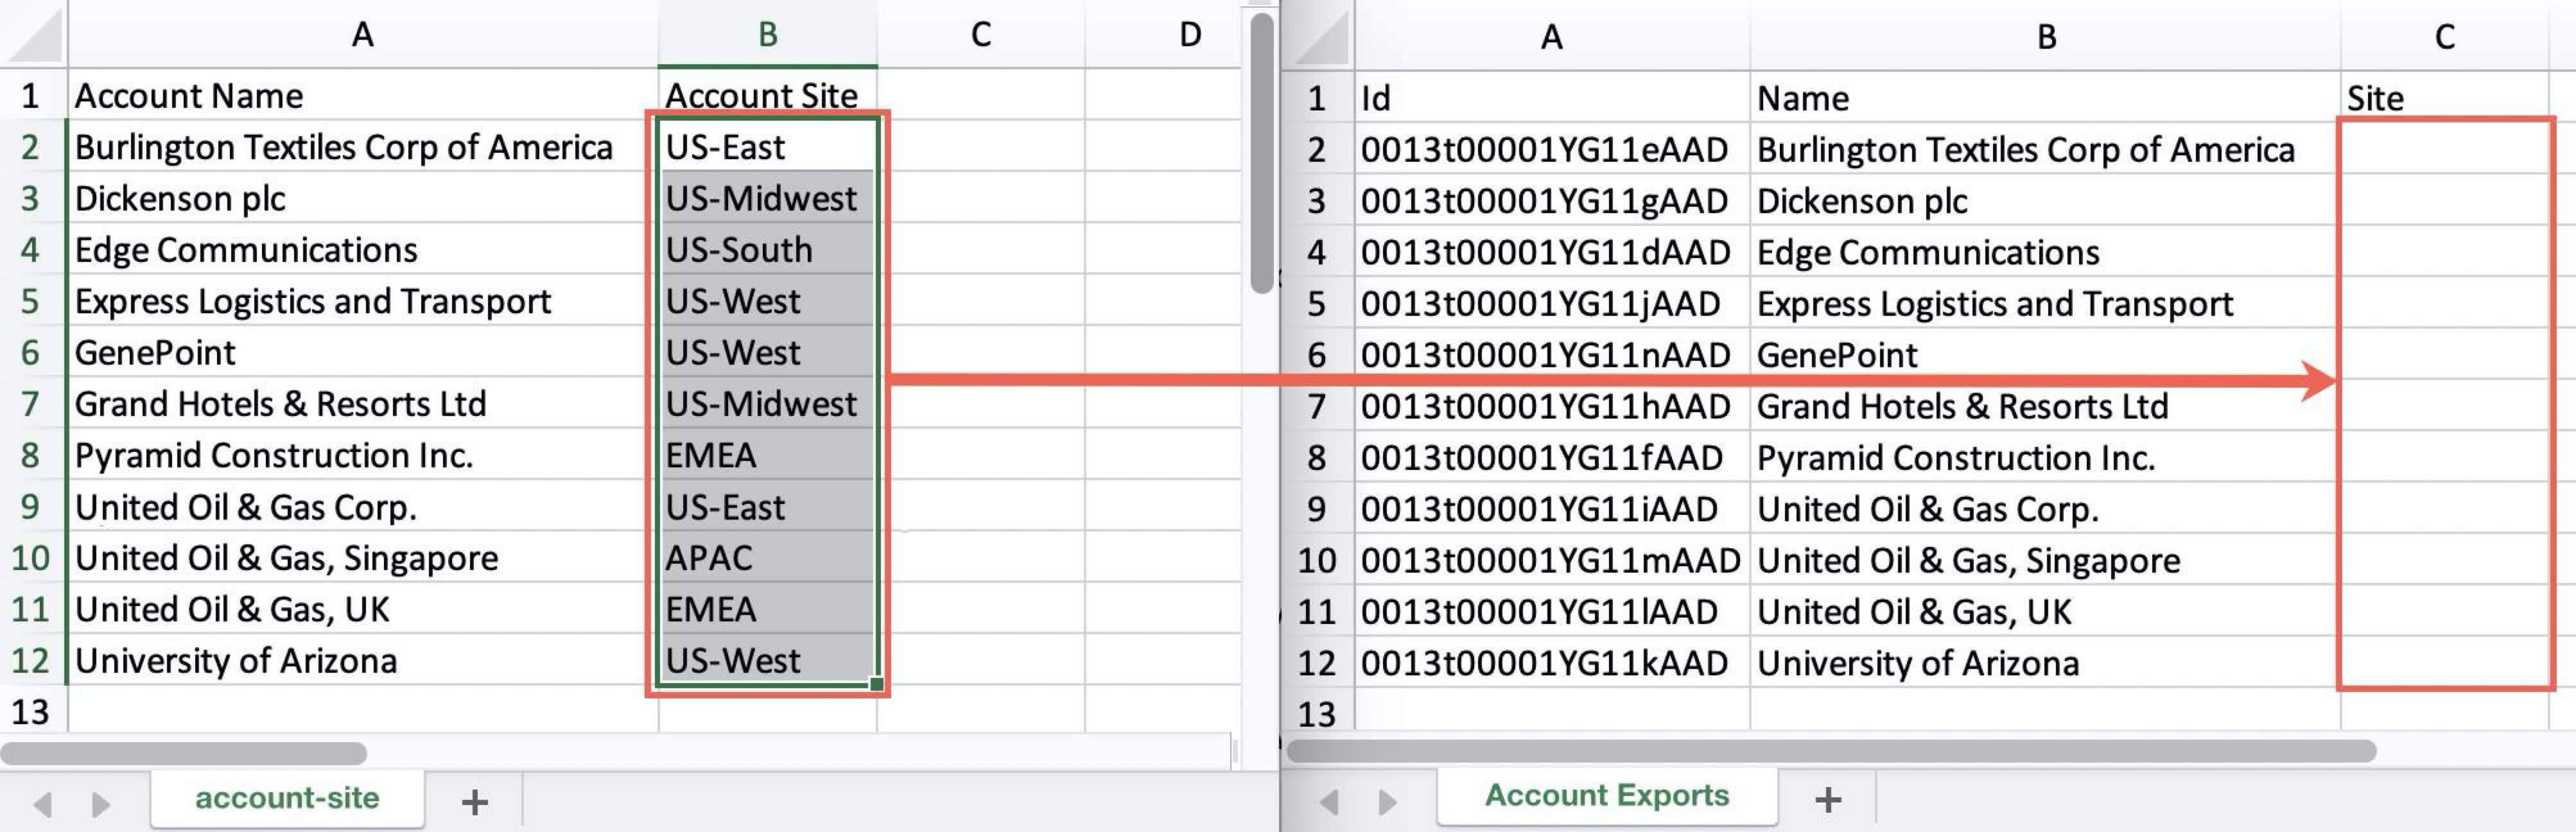 account-site スプレッドシートから ccount Exports スプレッドシートへの [Site (サイト)] データの移動